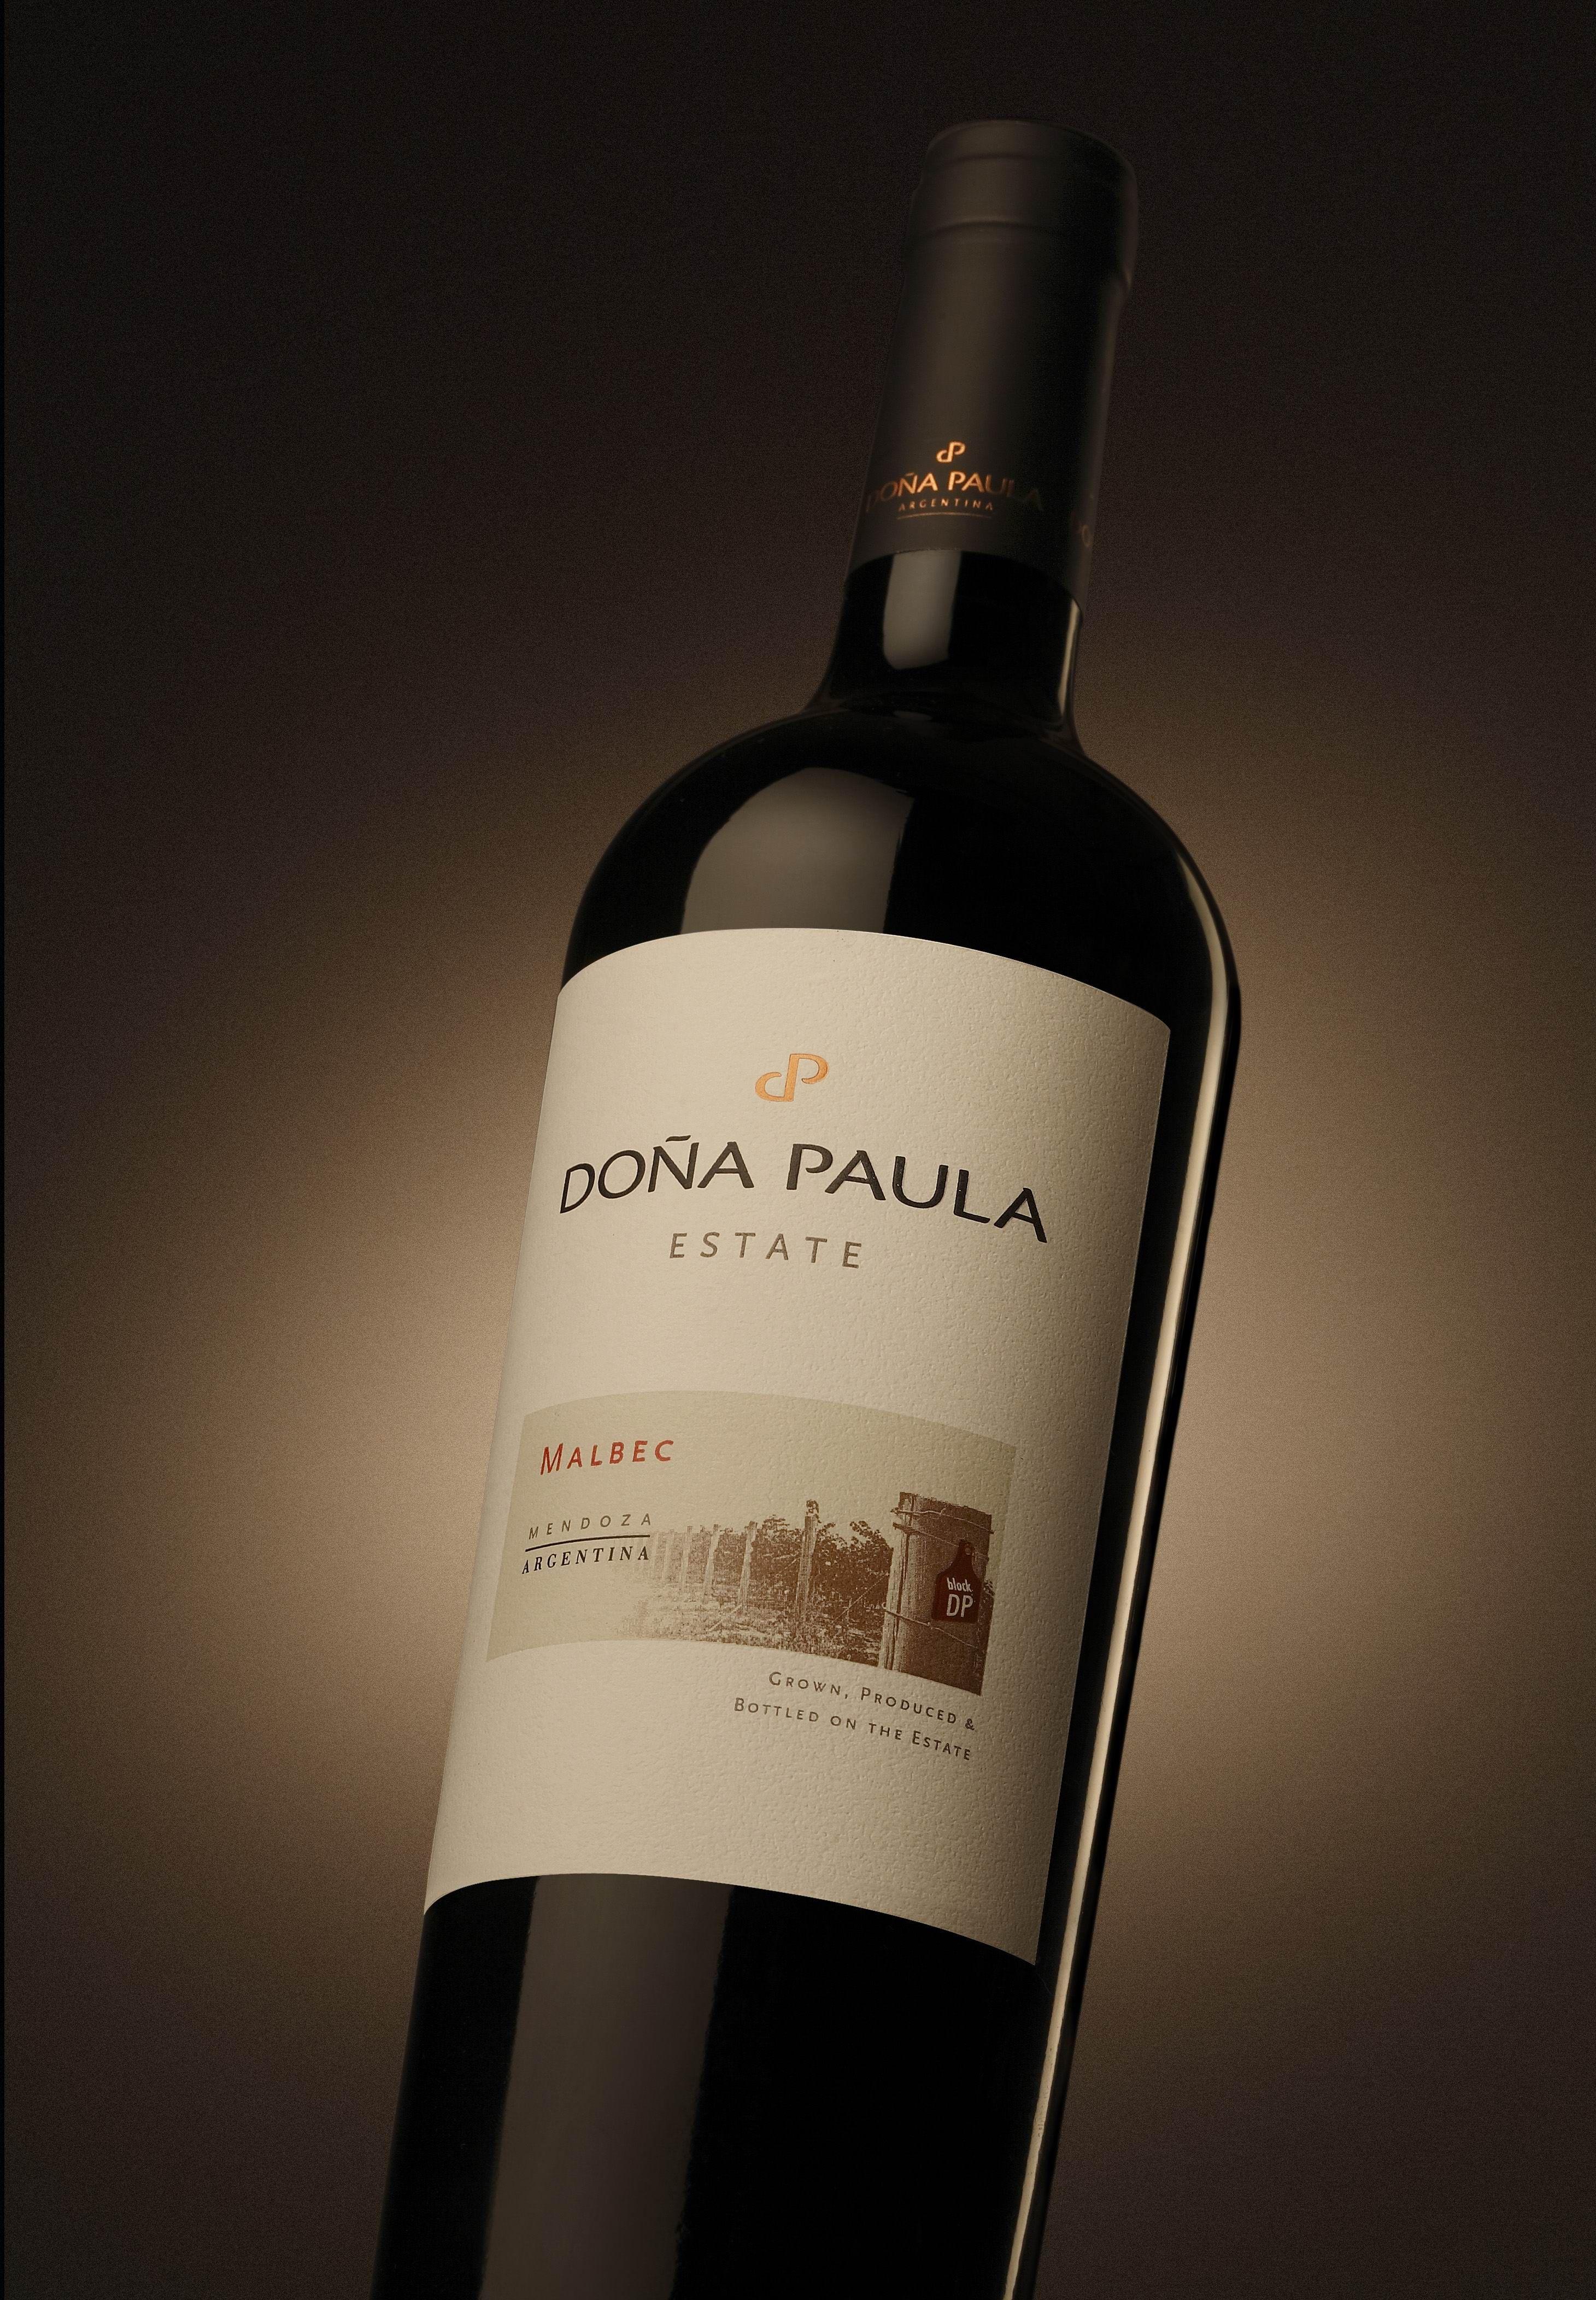 Dona Paula Estate Malbec De Bodega Dona Paula Un Vino Intenso